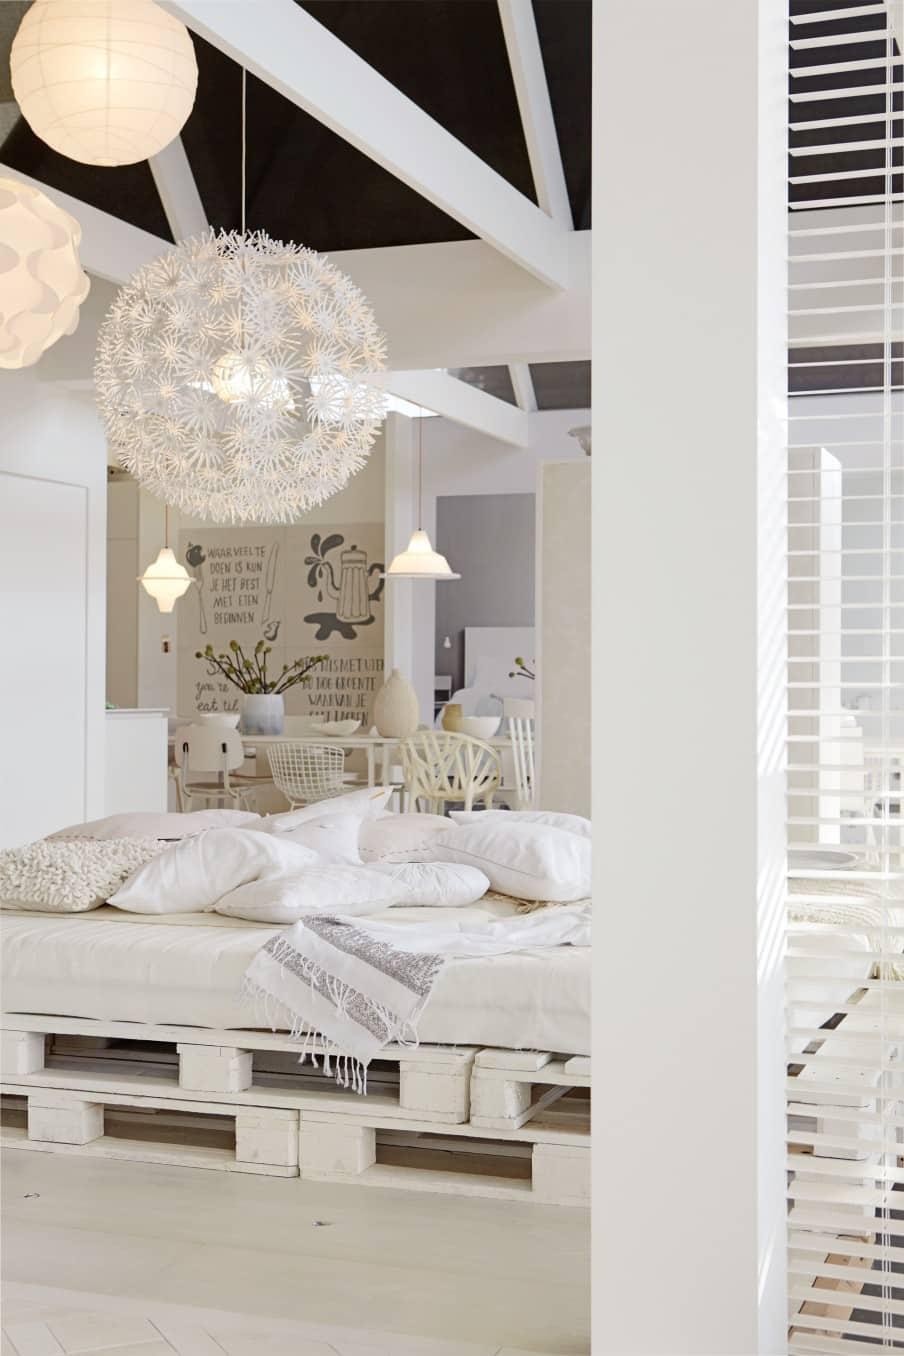 yatak-odaniza-ahsap-palet-yatak-fikirleri-7